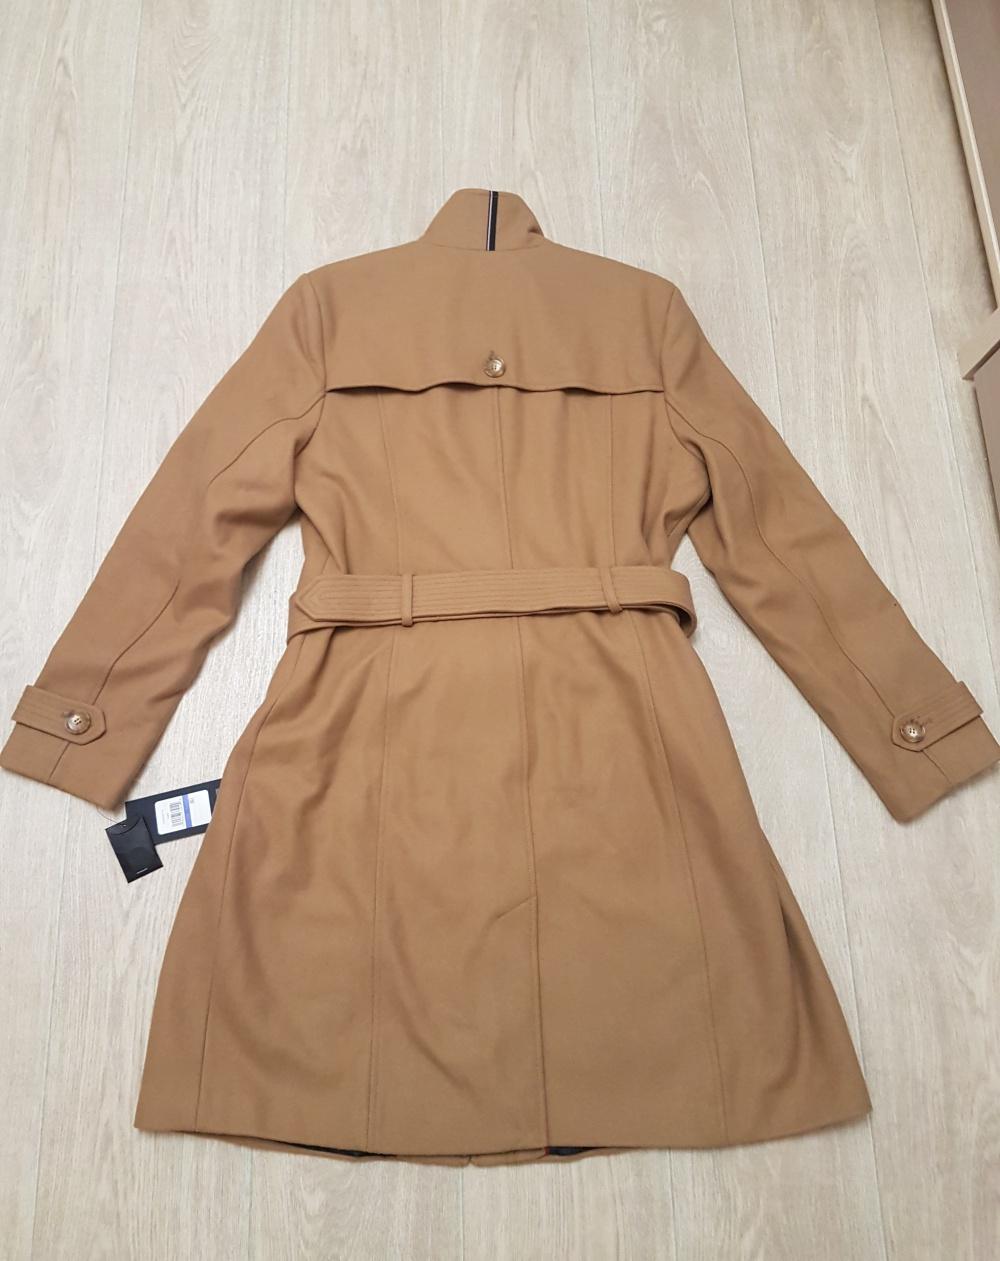 Шерстяное пальто (тренч) Tommy Hilfiger, размер XL